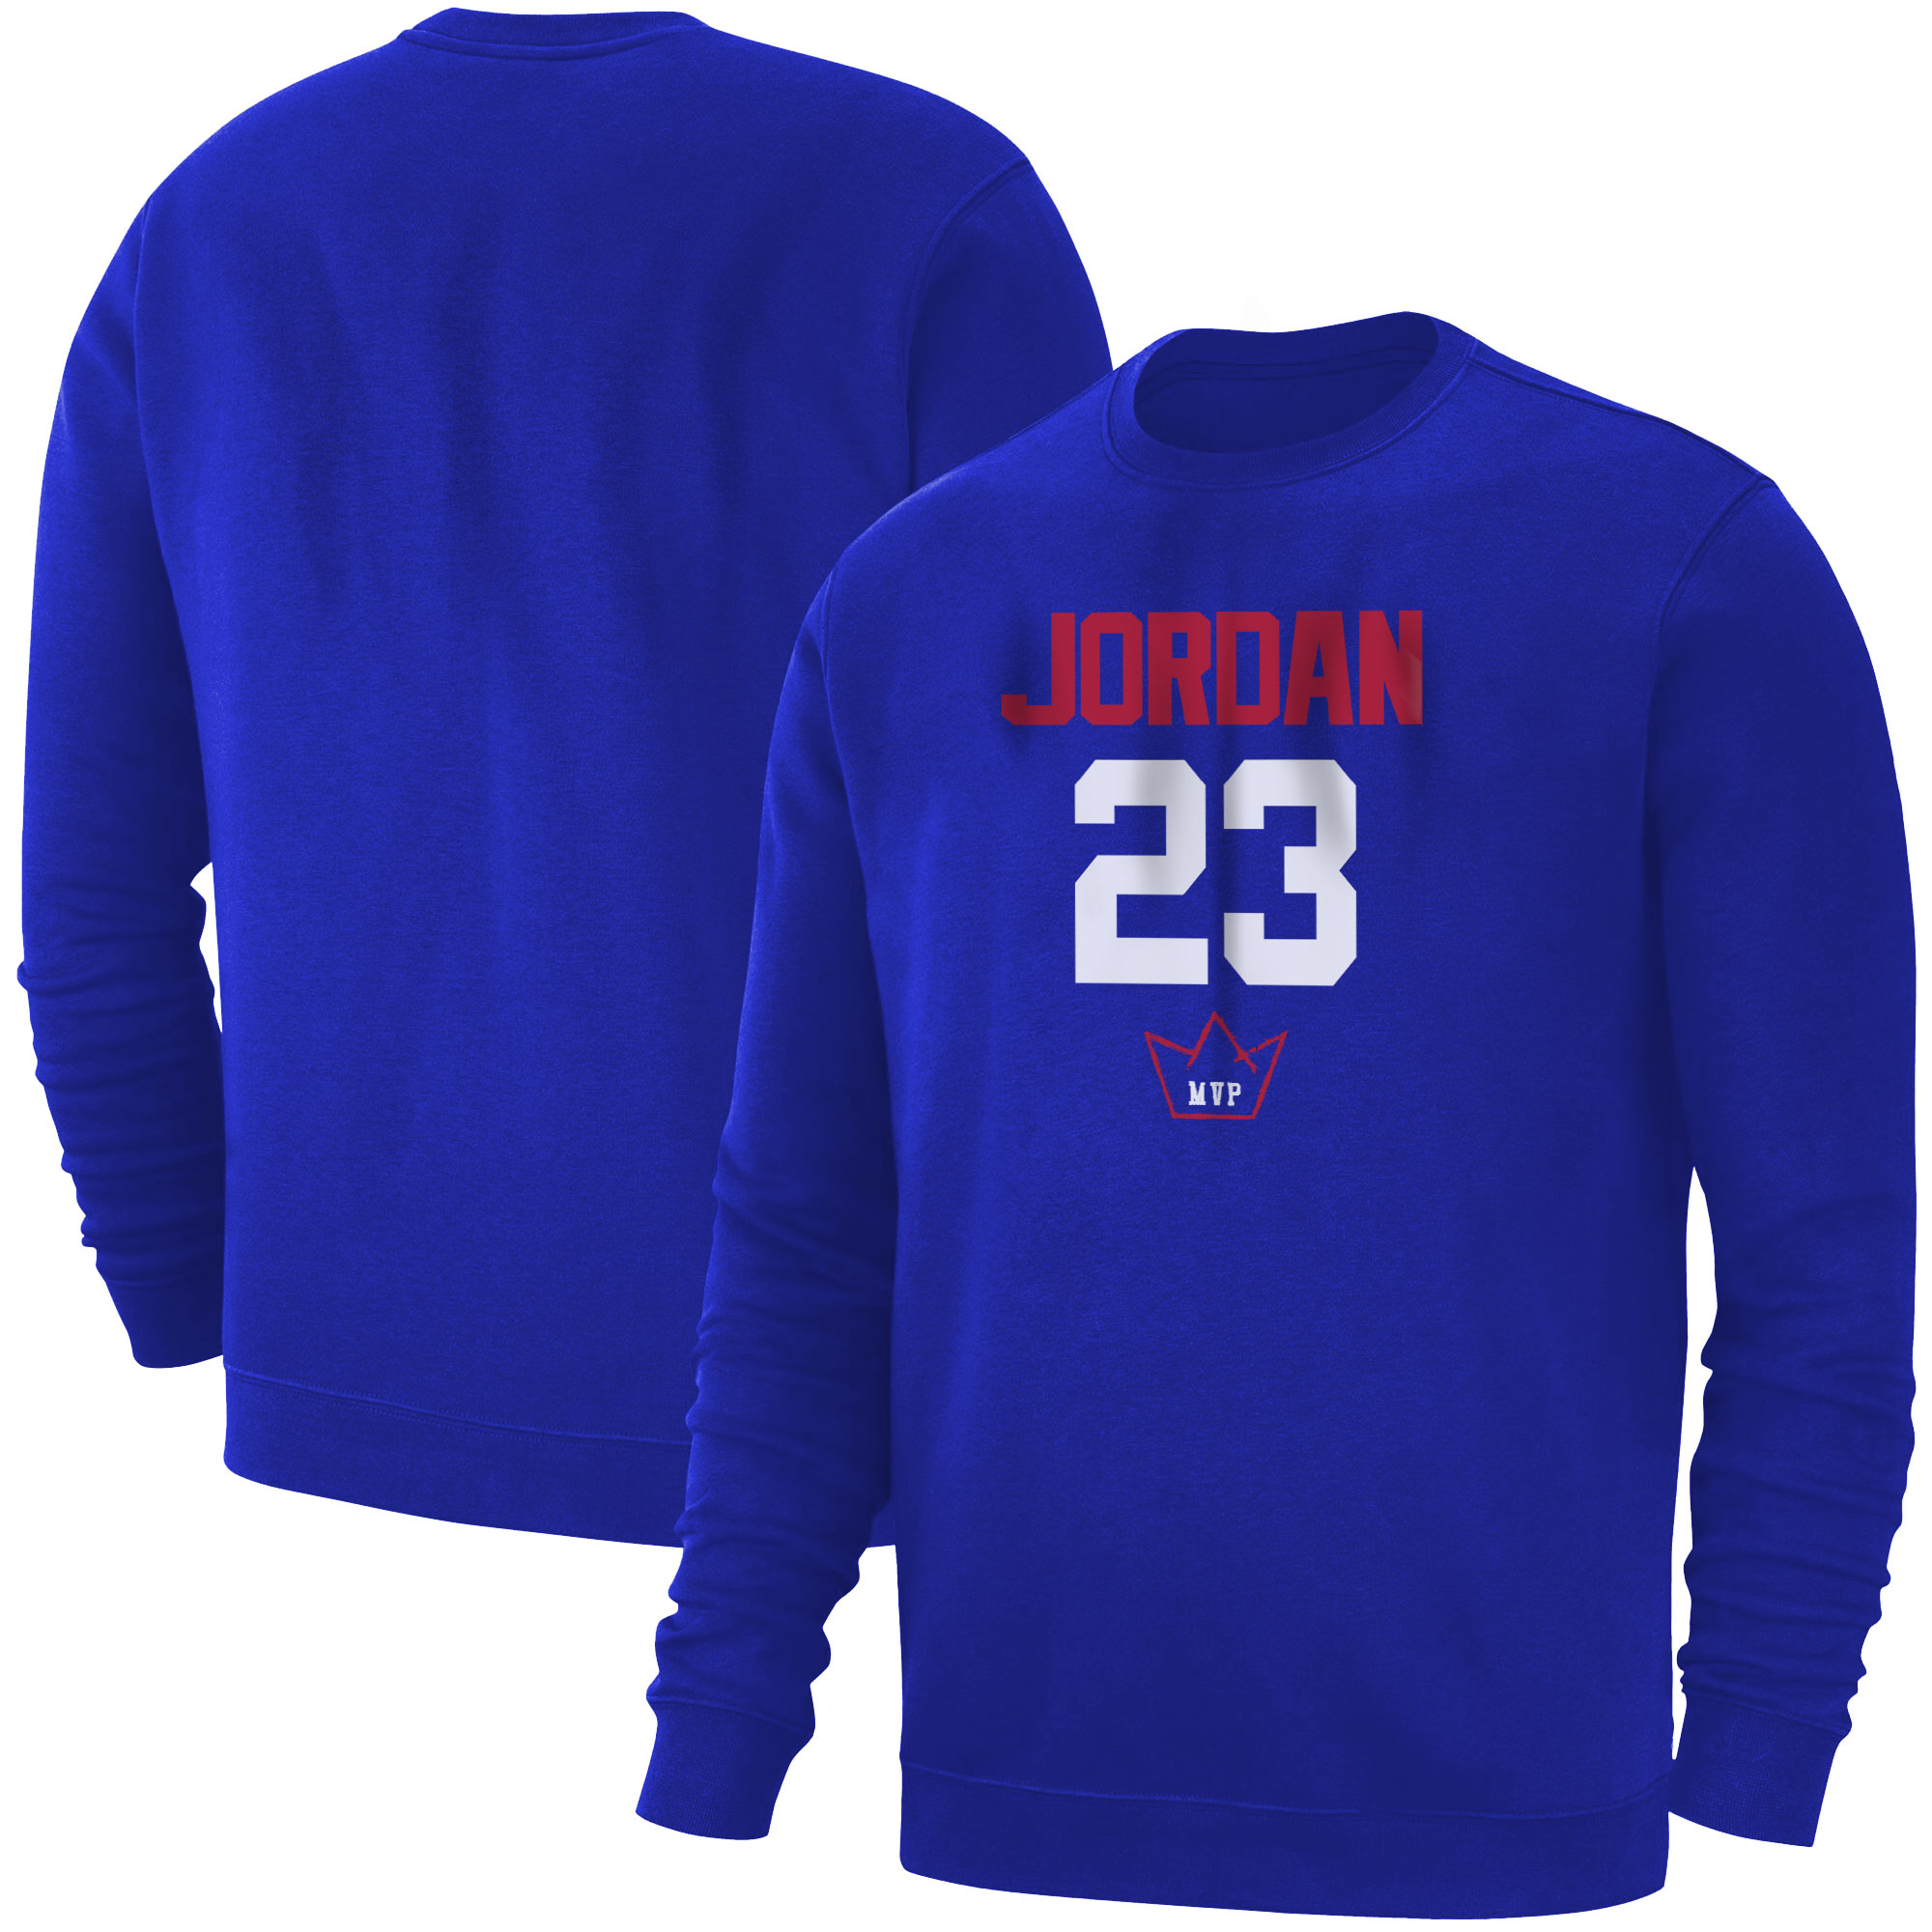 Michael Jordan Basic (BSC-BLU-494-PLYR-JRDN-23)